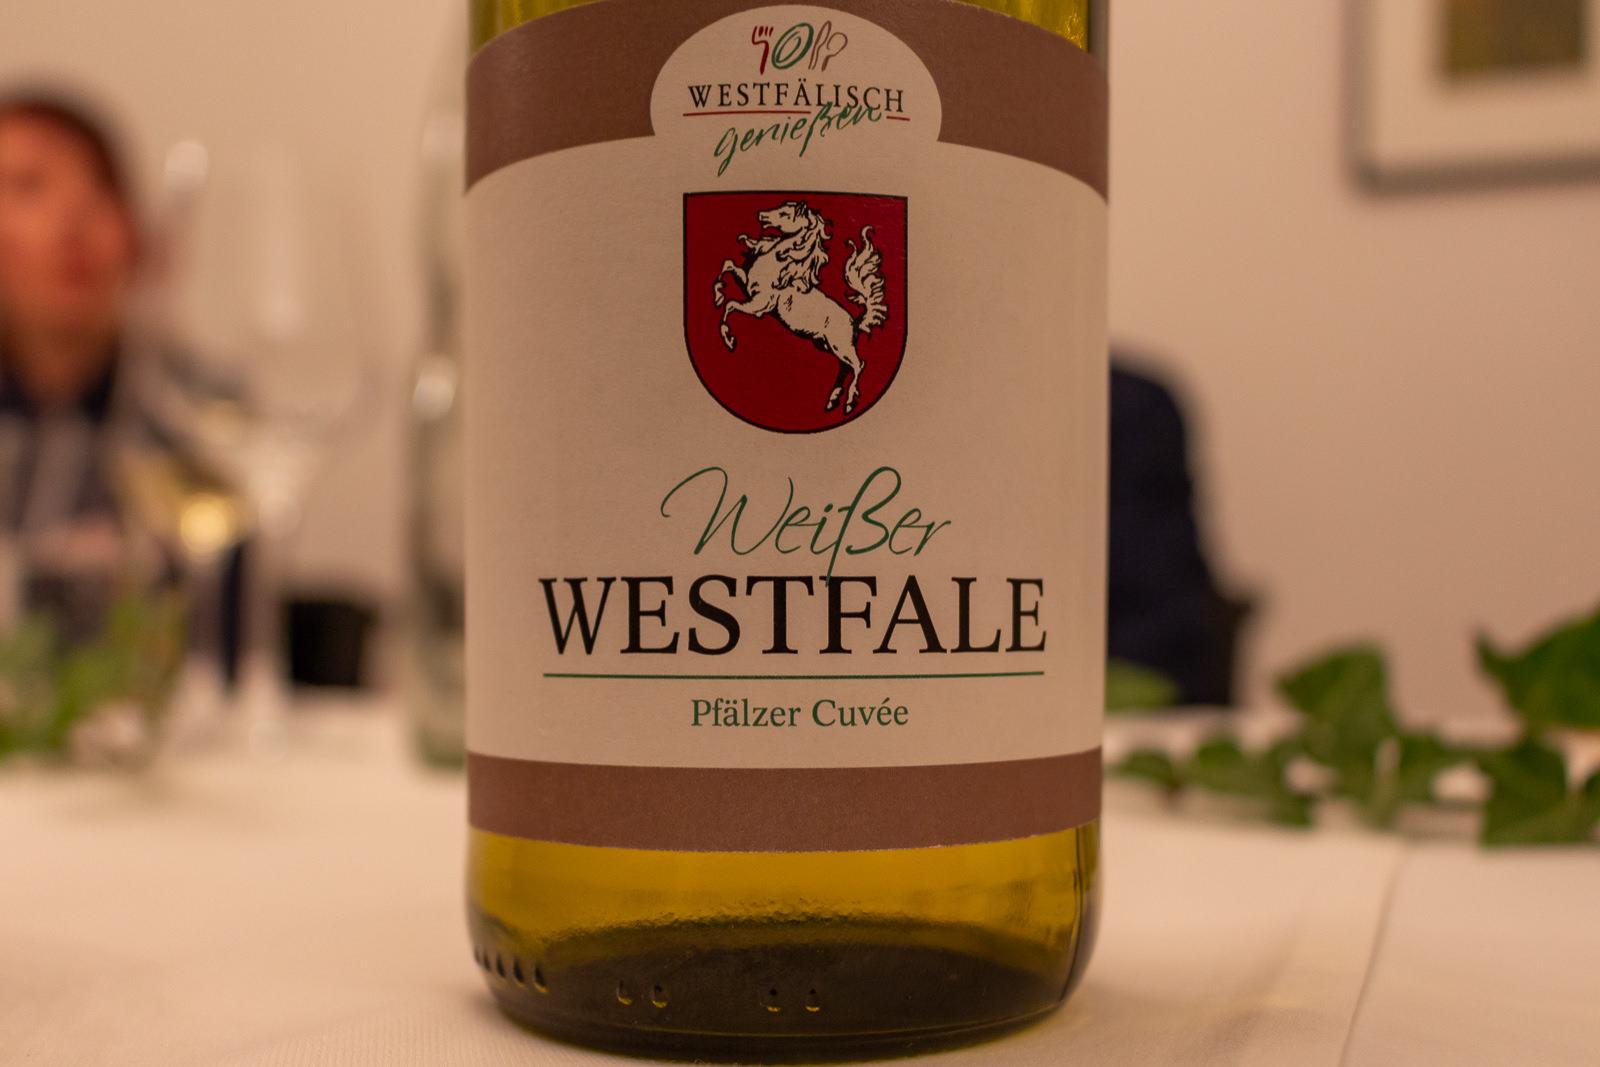 Westfälisch genießen, Warendorf, Westfalen, Genuss